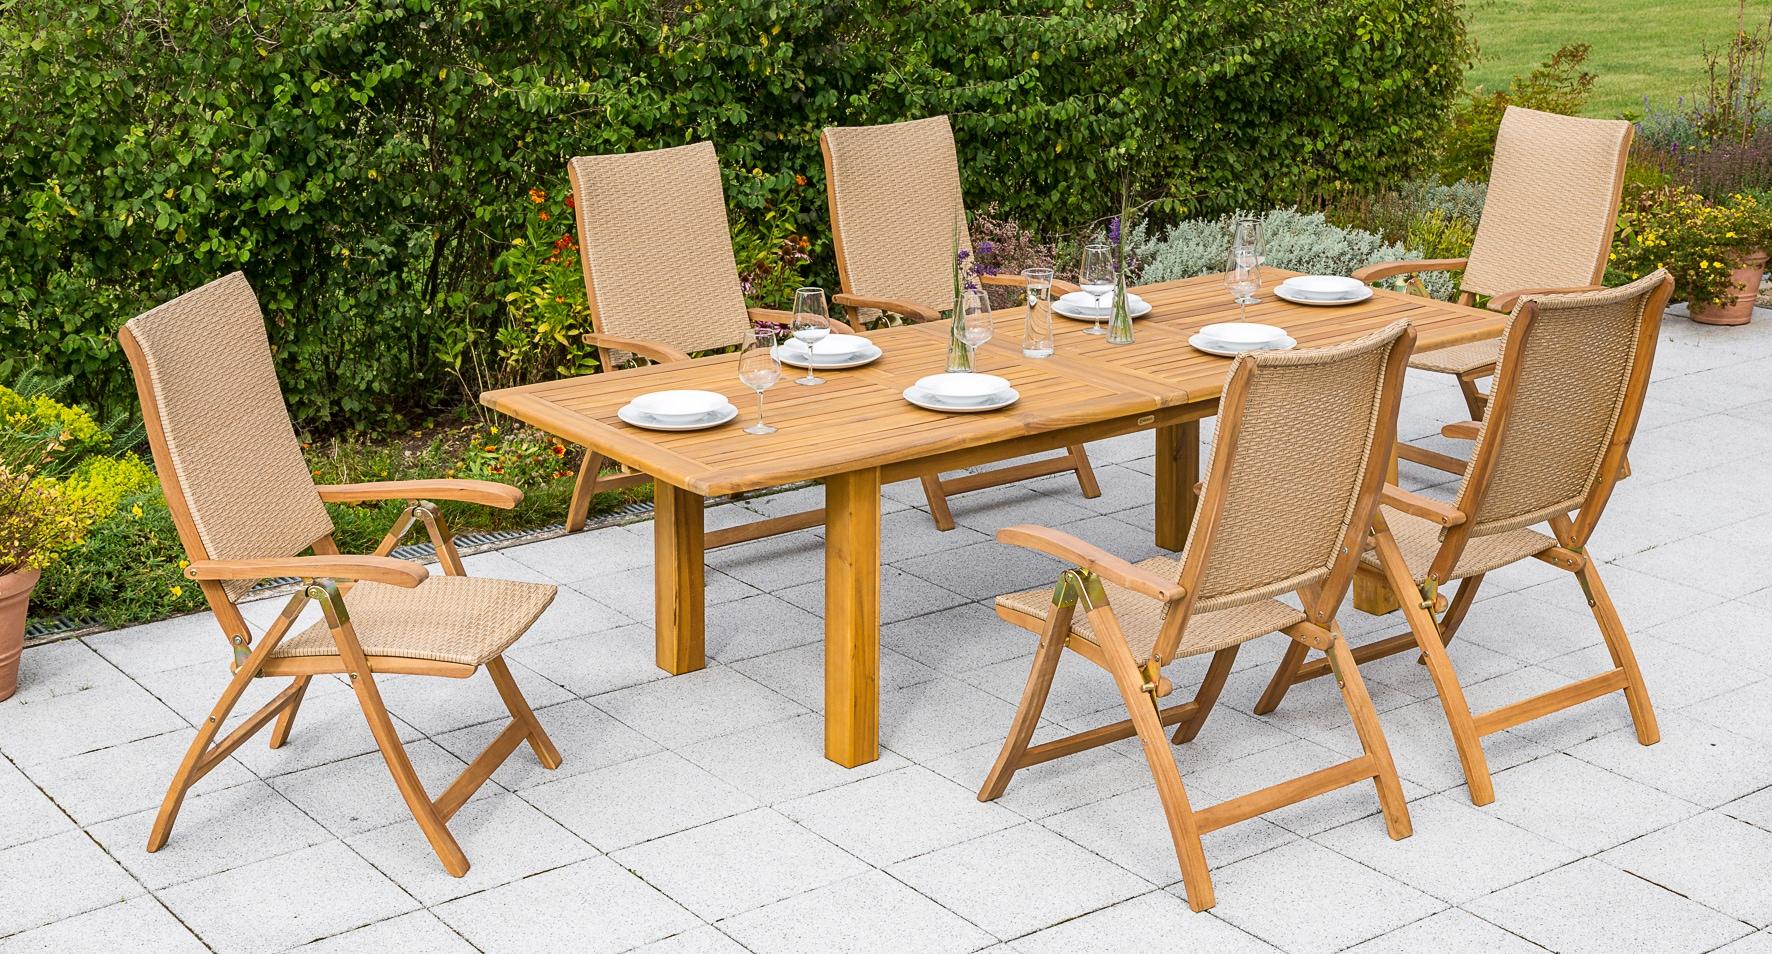 MERXX Gartenmöbelset Capri 7-tlg 6 Klappsessel Tisch 180-220-260x100 cm Akazienholz